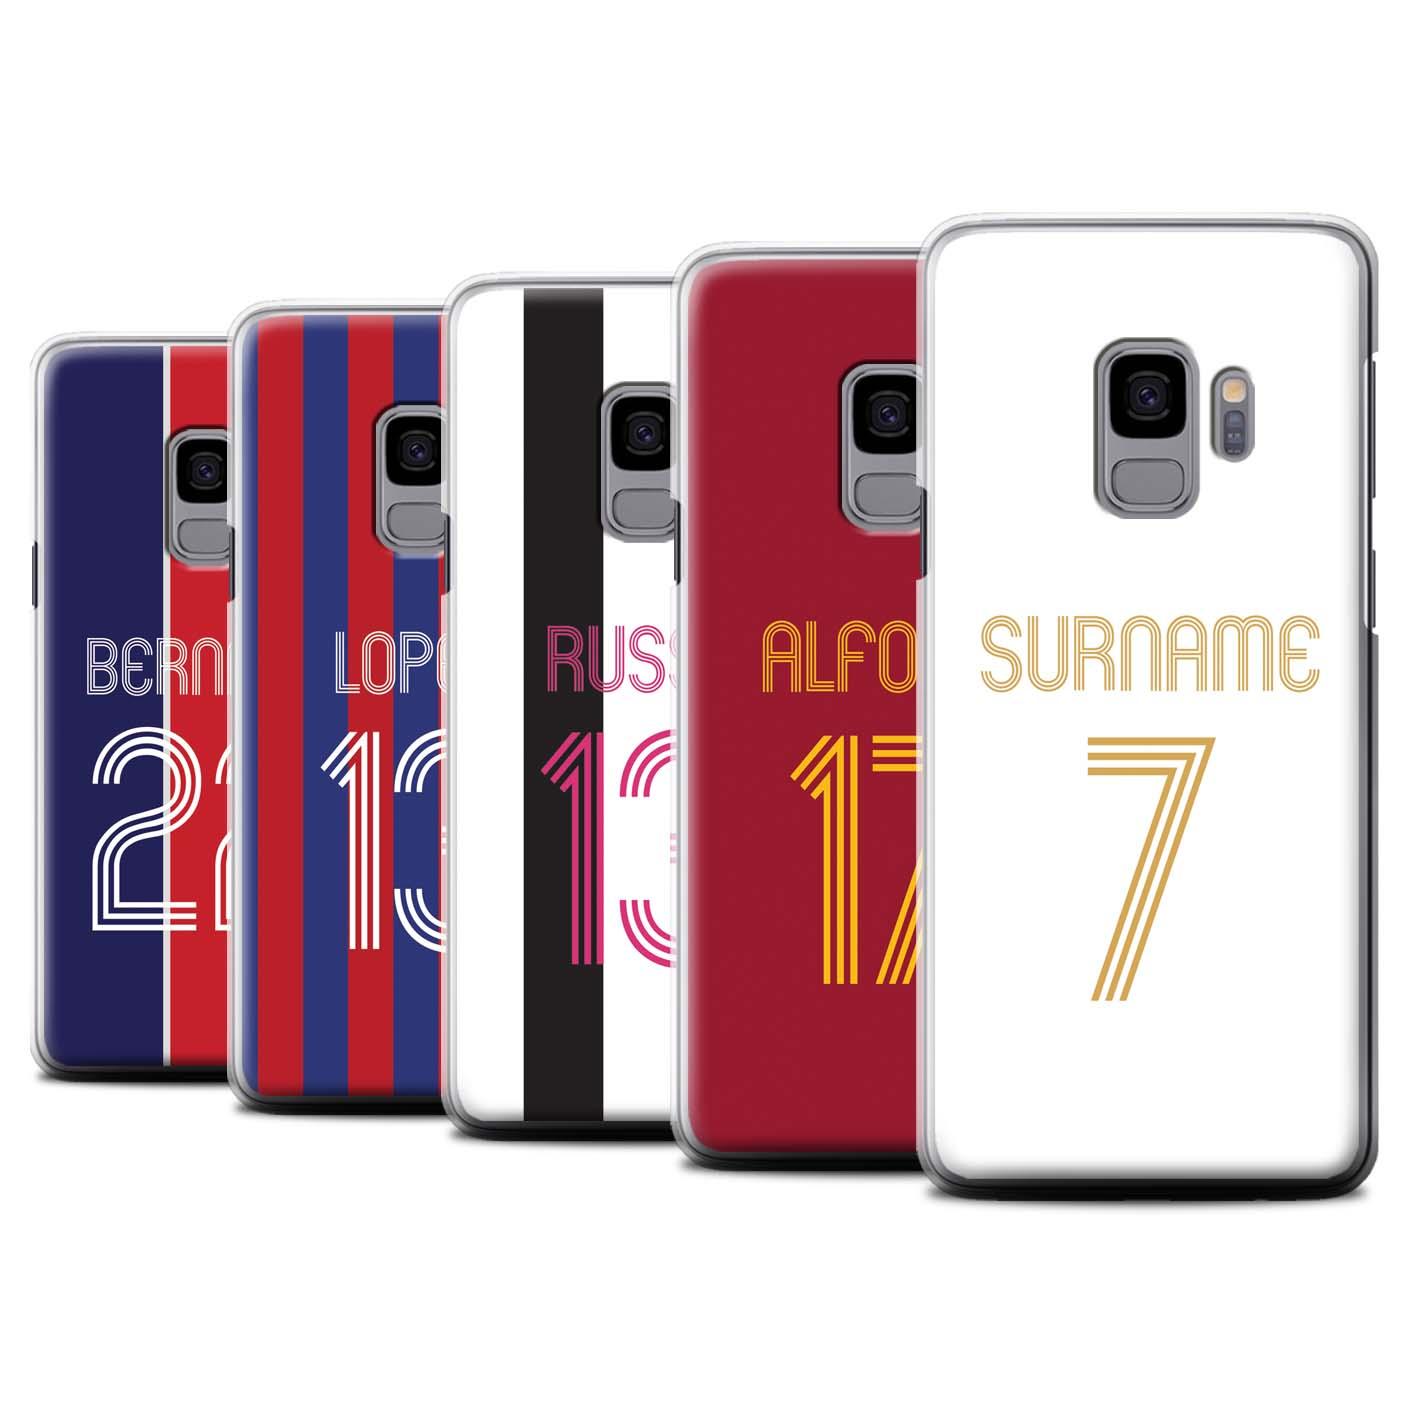 Personalised-Case-for-Samsung-Galaxy-S9-G960-Custom-Euro-Football-Club-Shirt-Kit